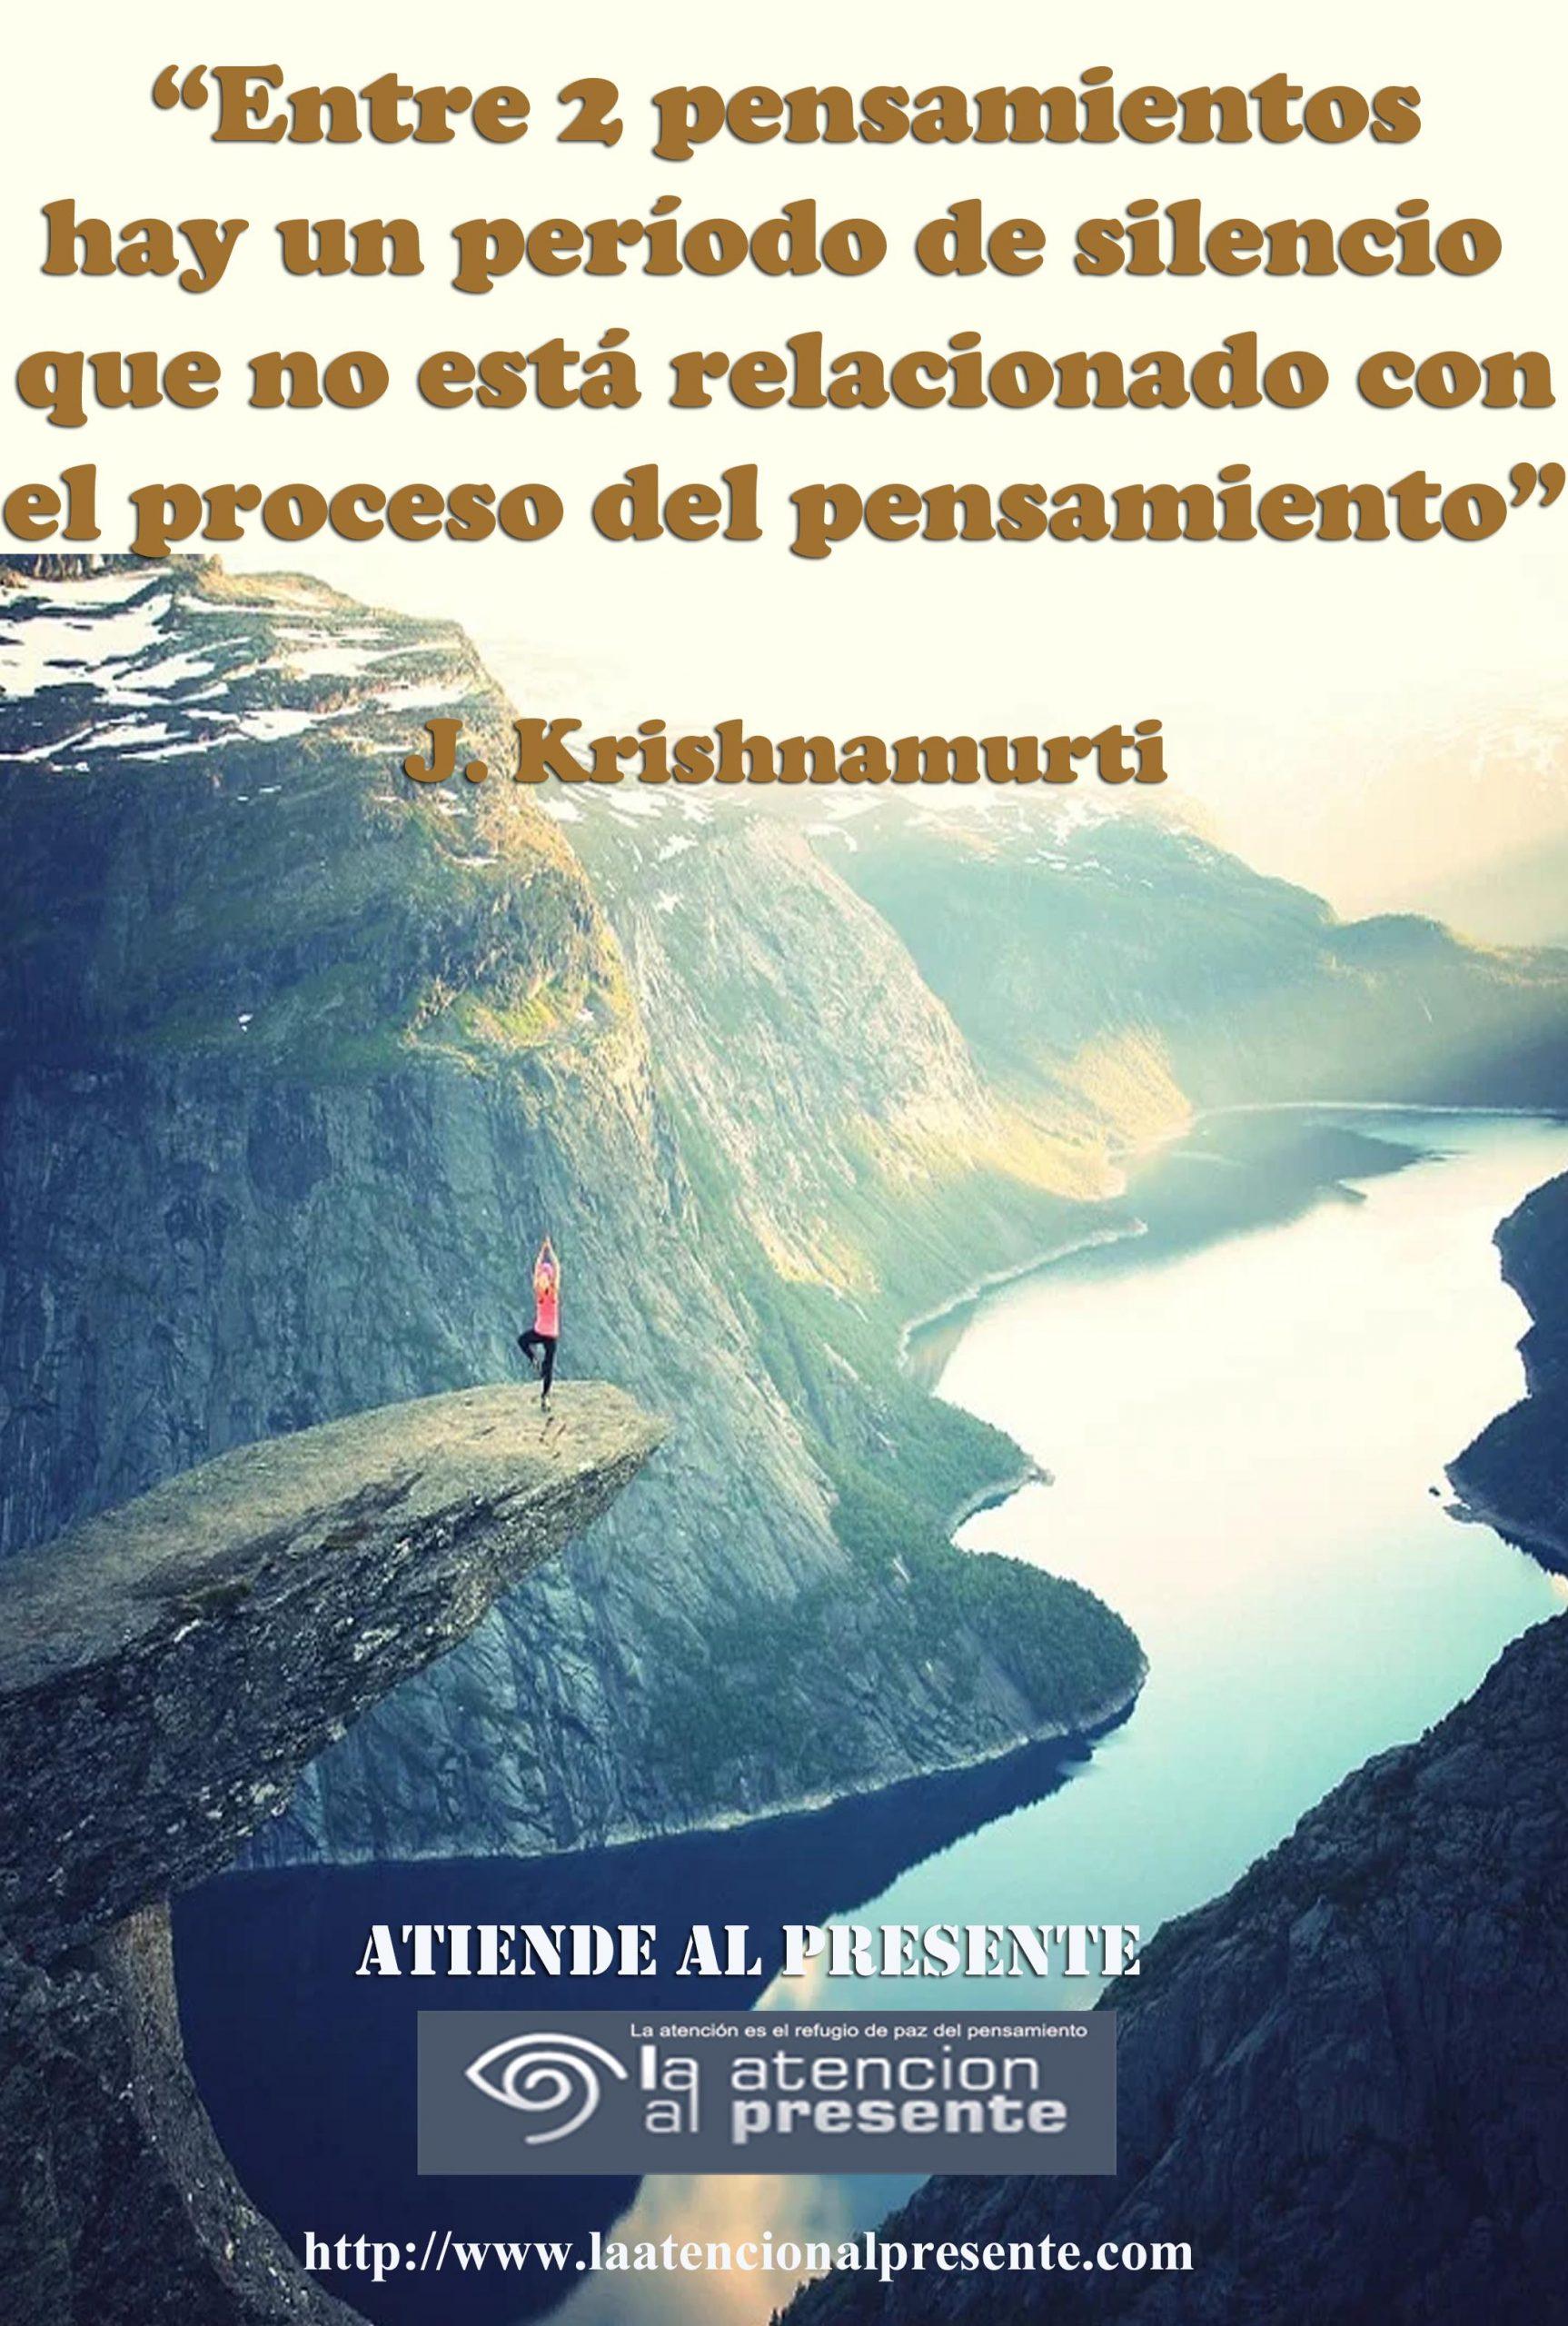 6 de Diciembre t Krishnamurti Entre 2 pensamientos min scaled